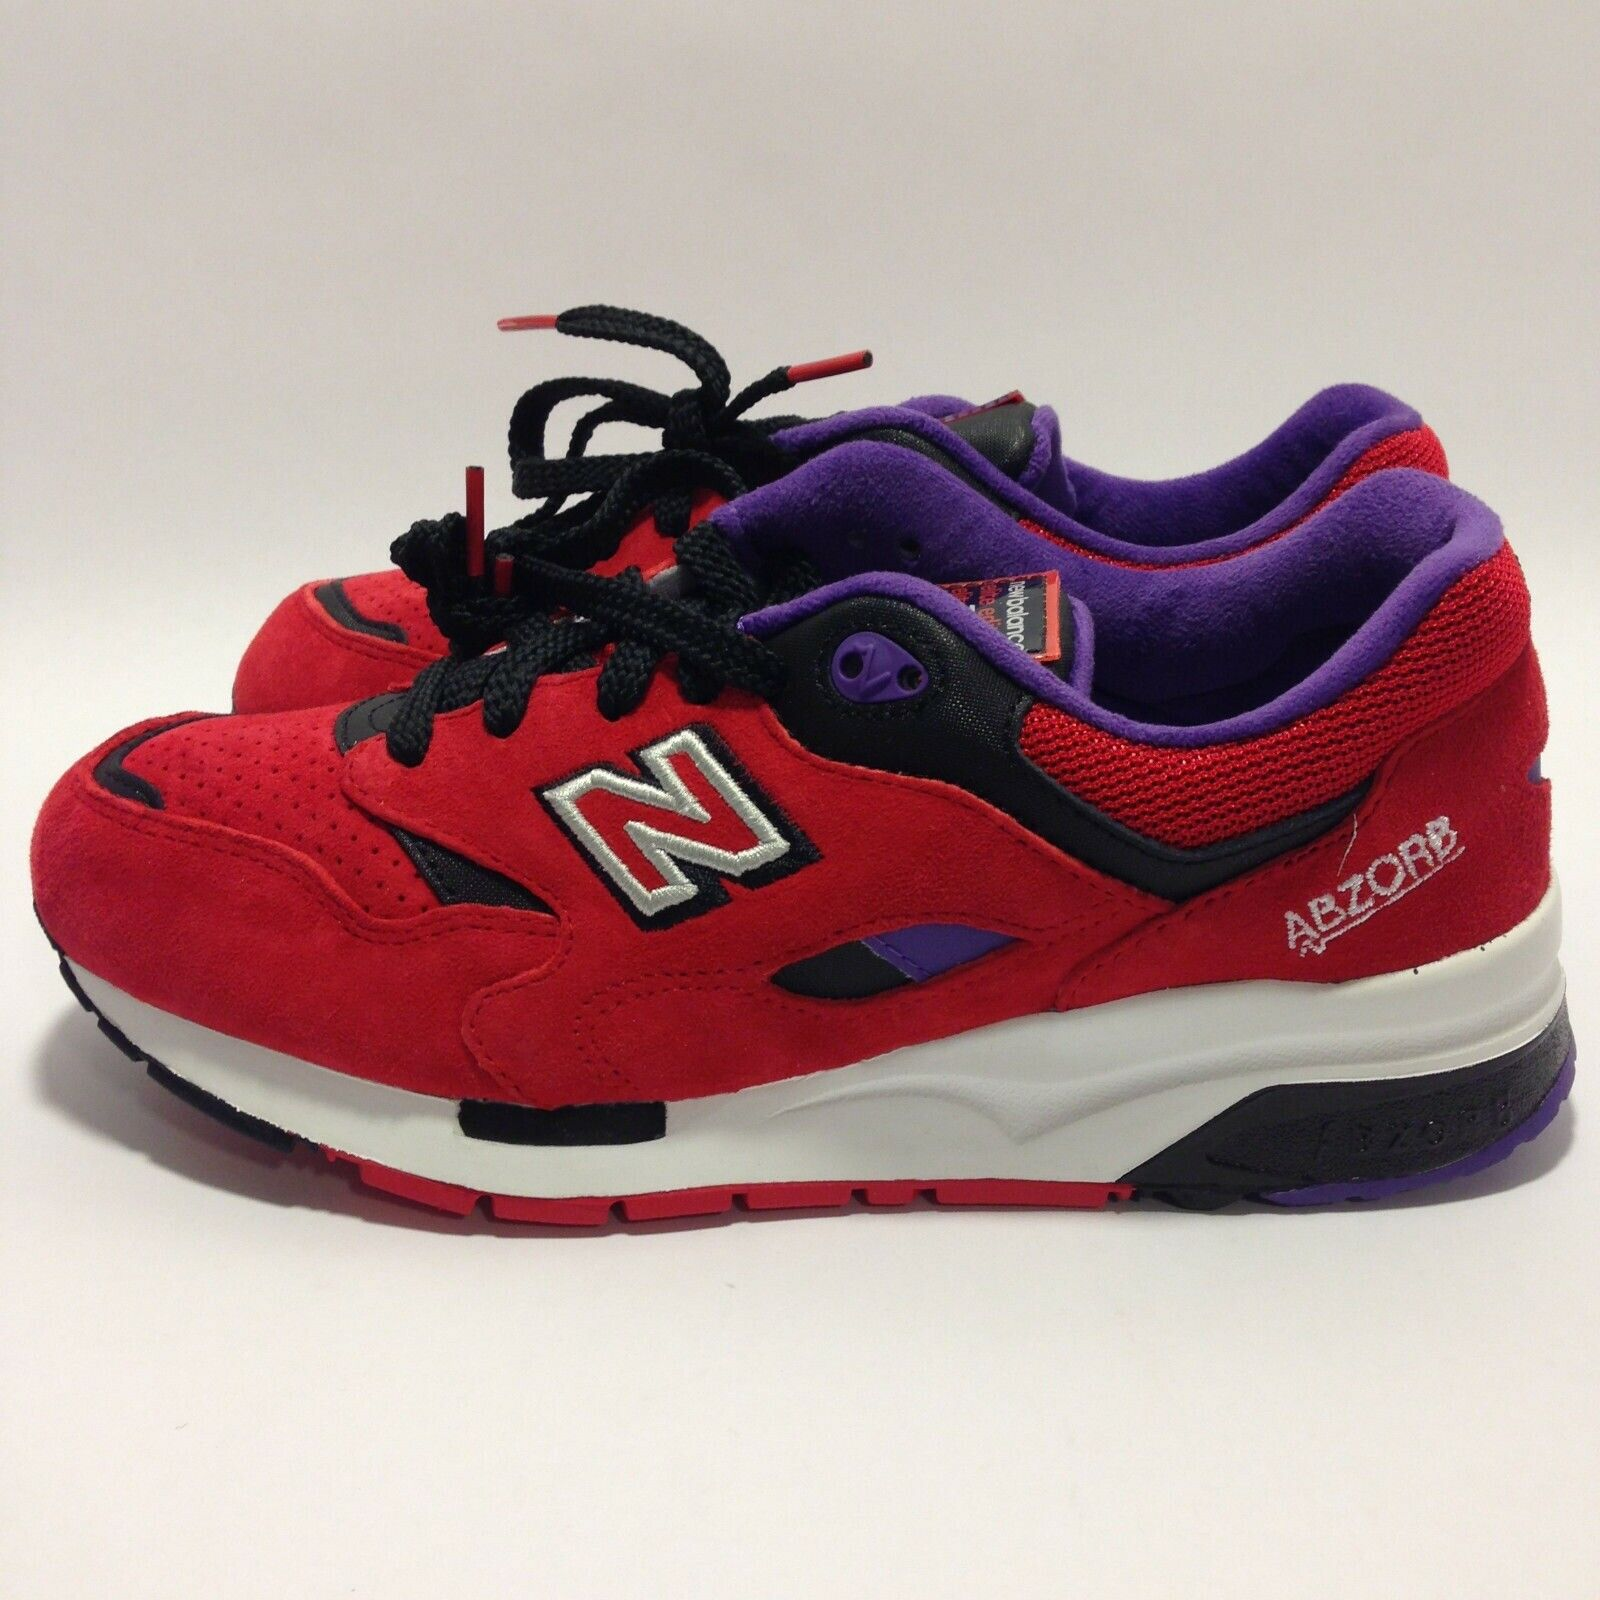 New Balance  Elite  Pinball  (Red Black Purple) Men's shoes Size  7